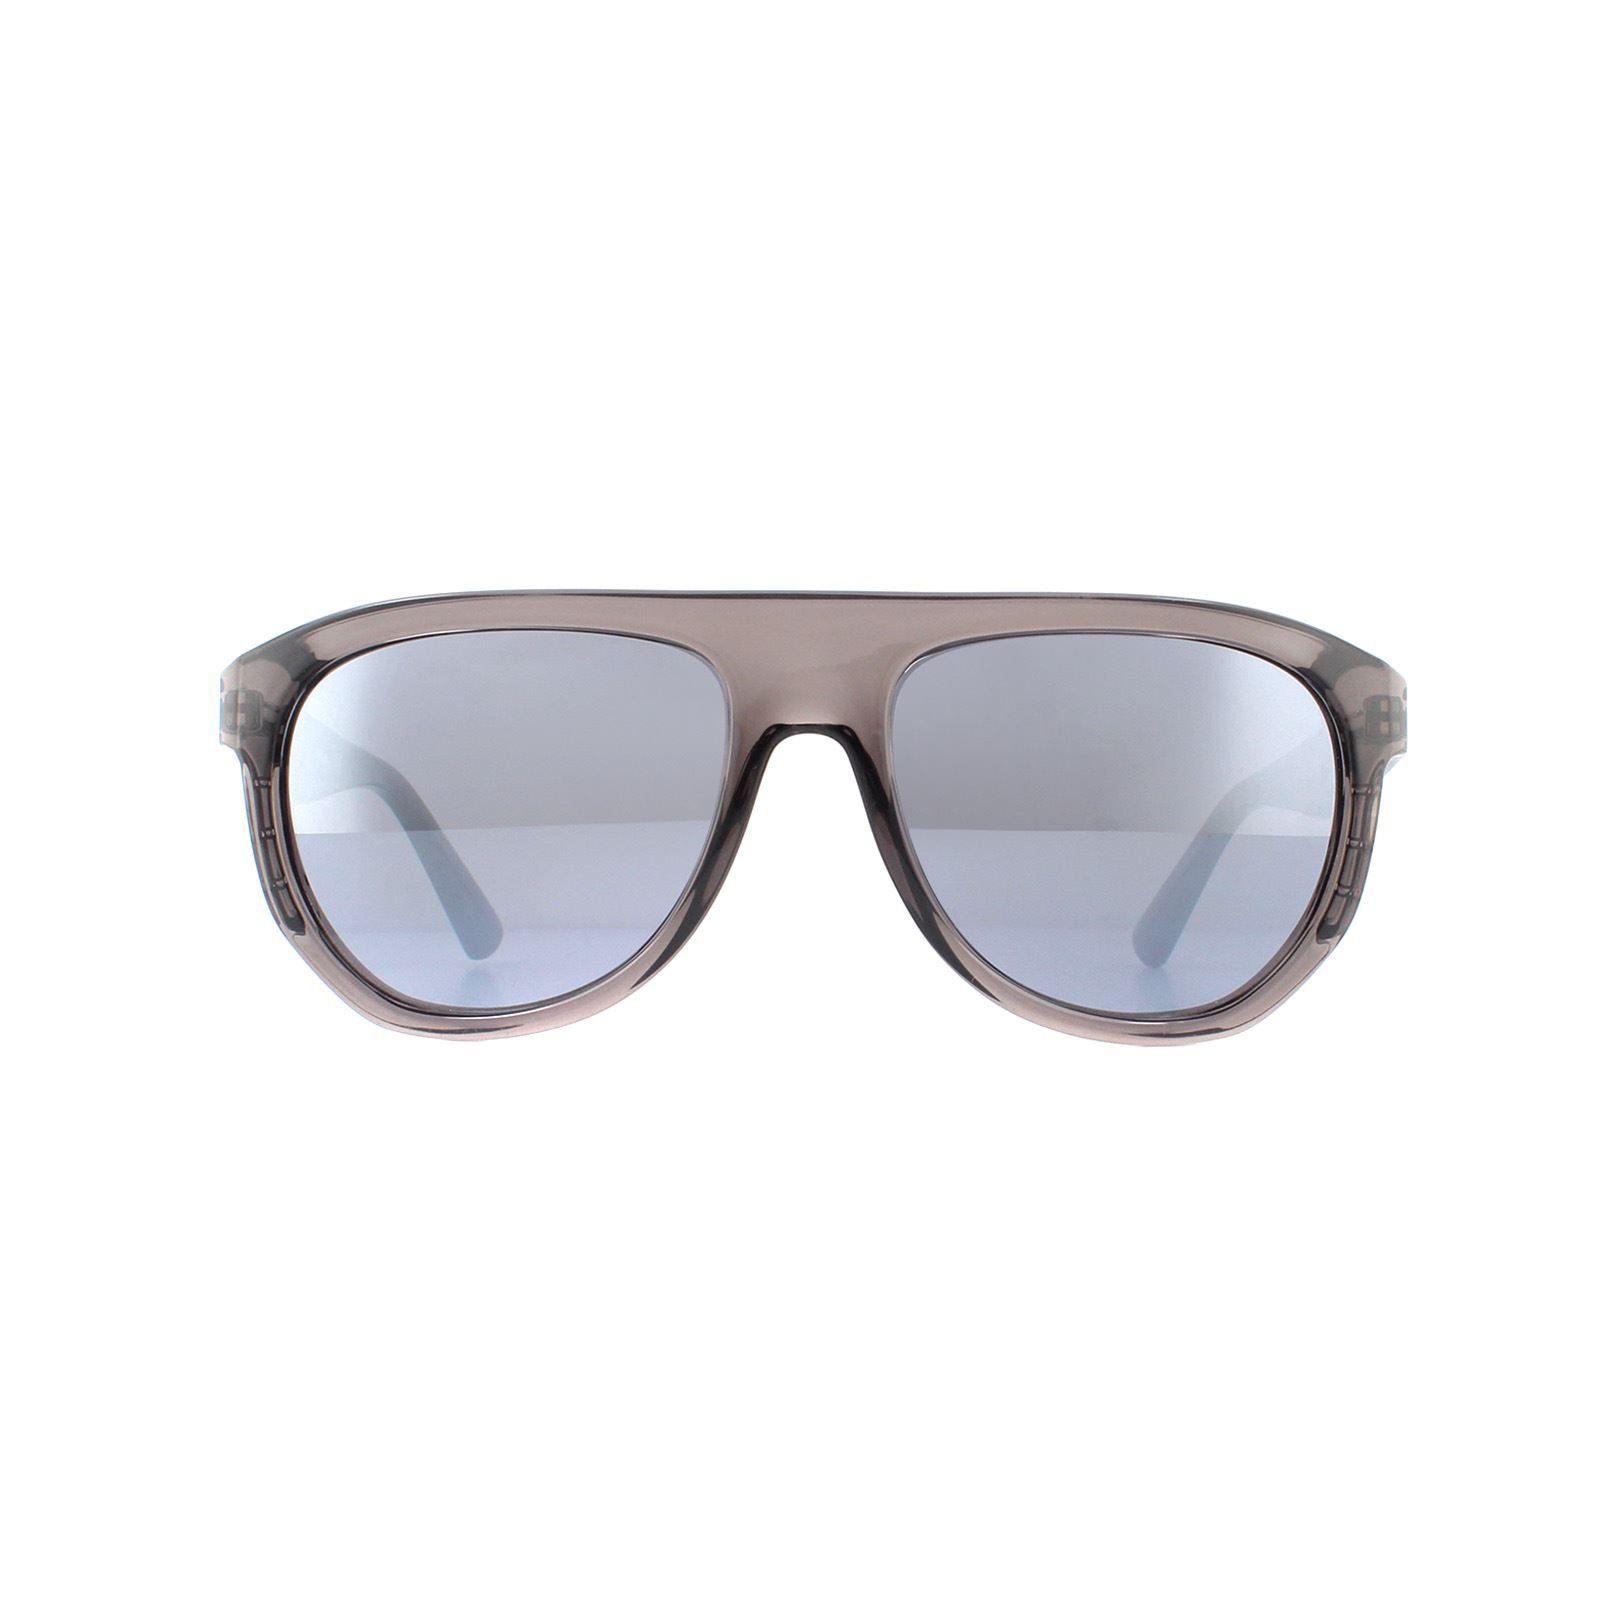 Diesel Sunglasses DL0255 20C Grey Grey